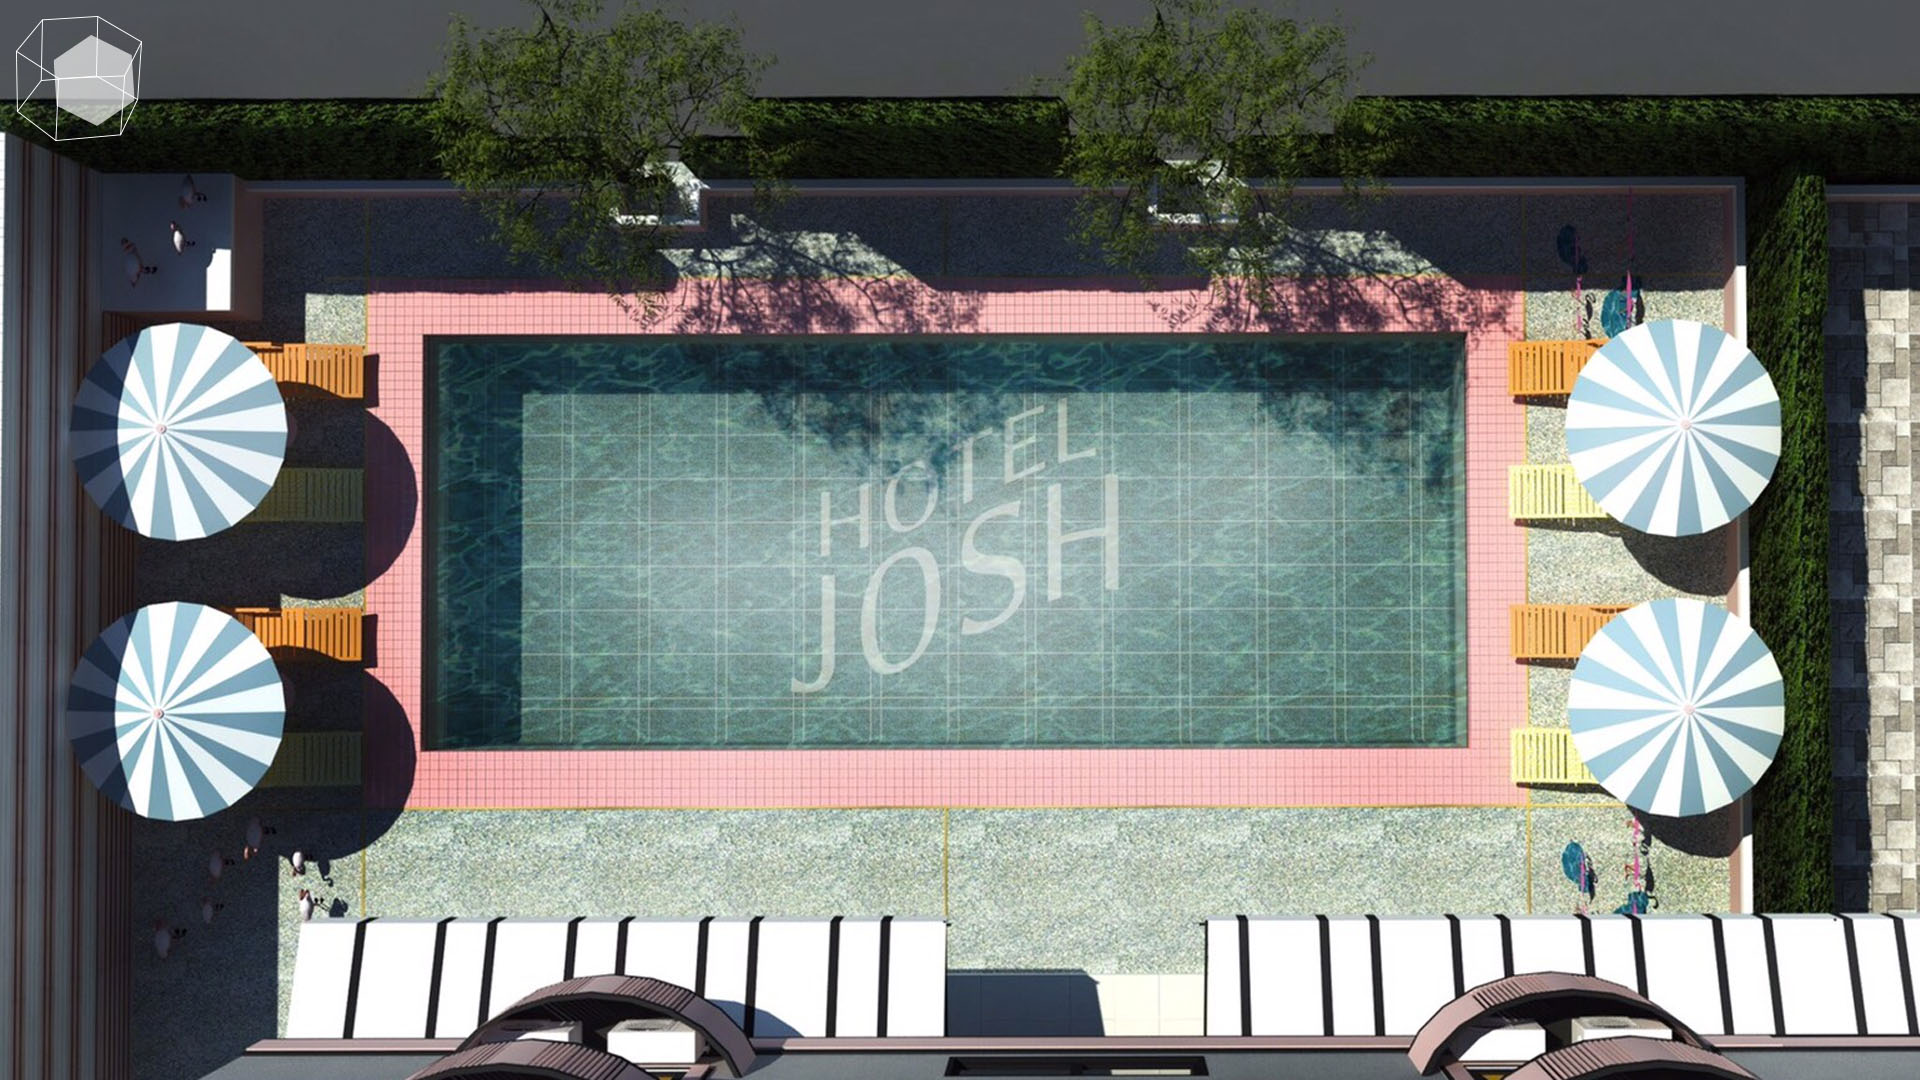 Josh Hotel